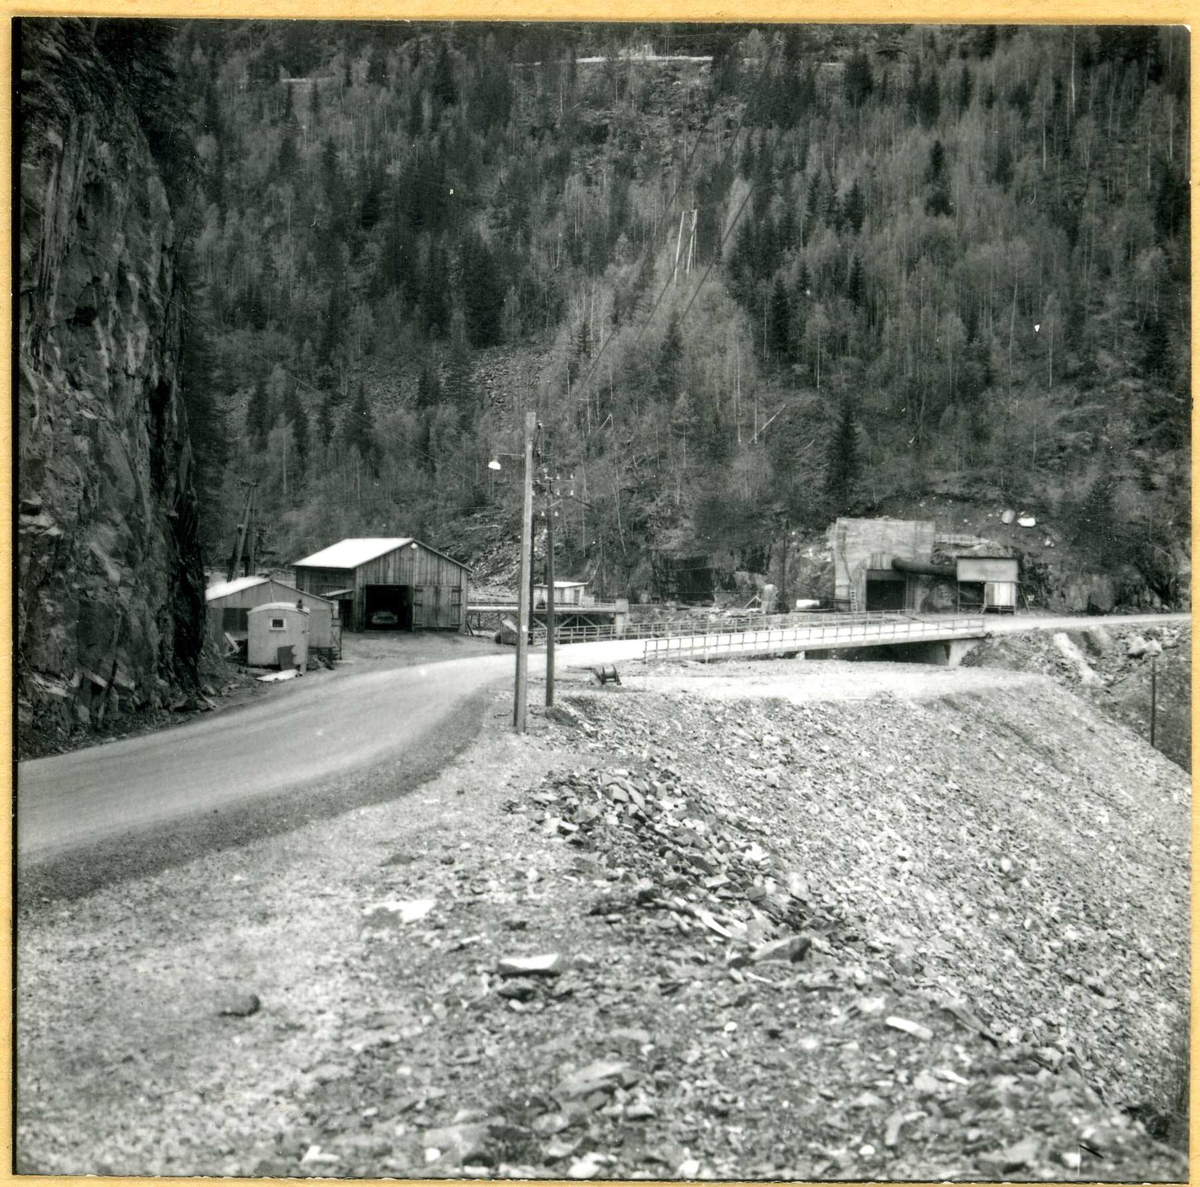 779-4 Påhugg a-tunnel Lio